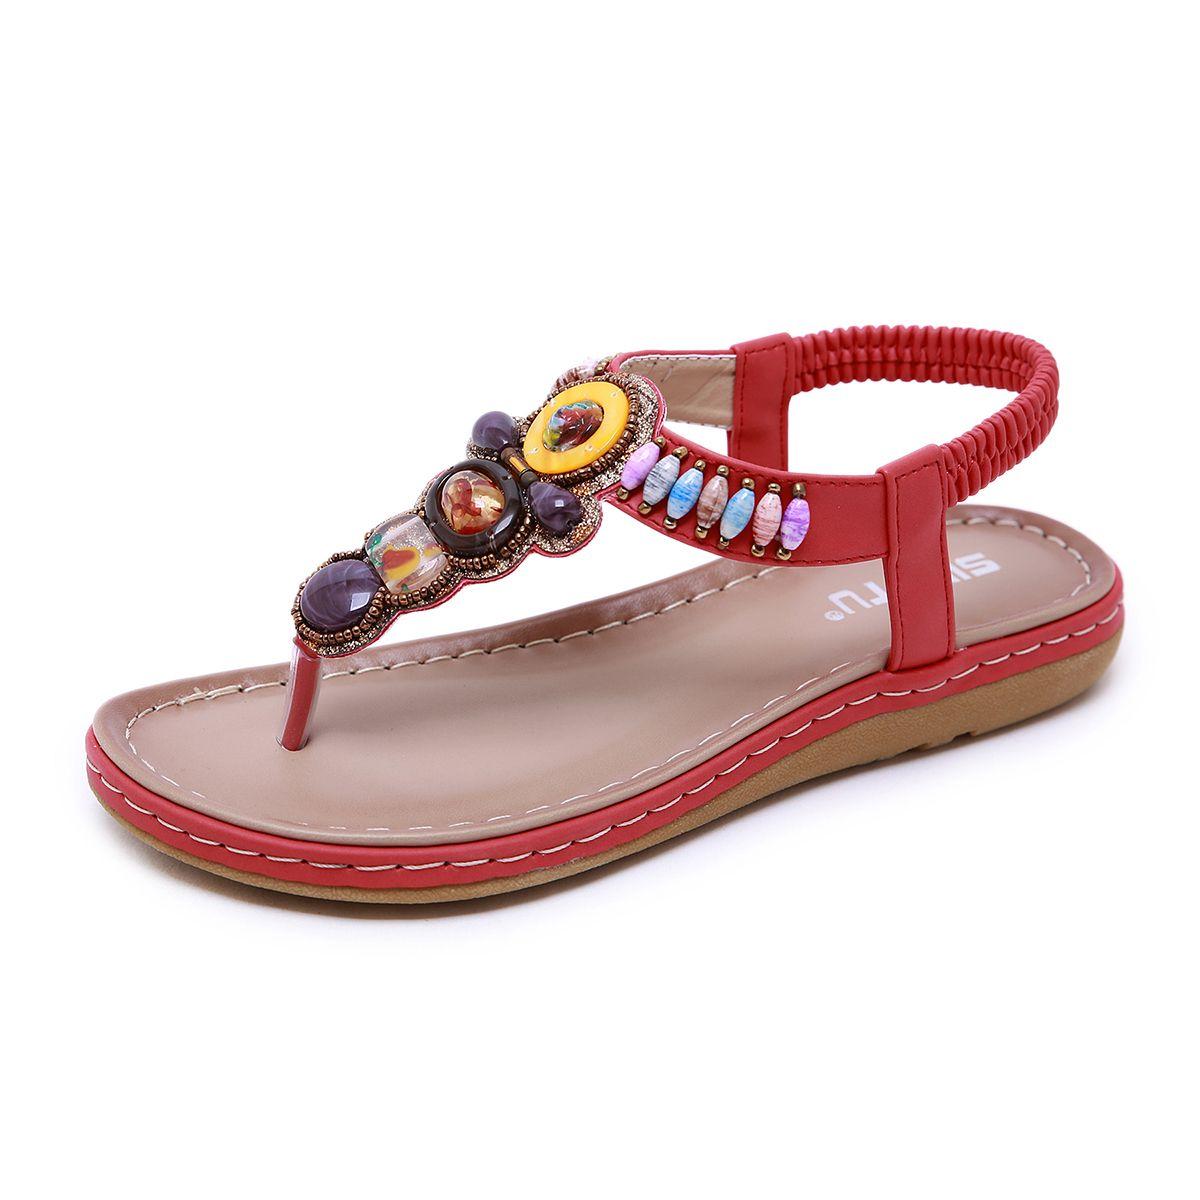 132aa5aff59f Gladiator Sandals For Ladies Bohemia Beaded Thong Sandal Women ...